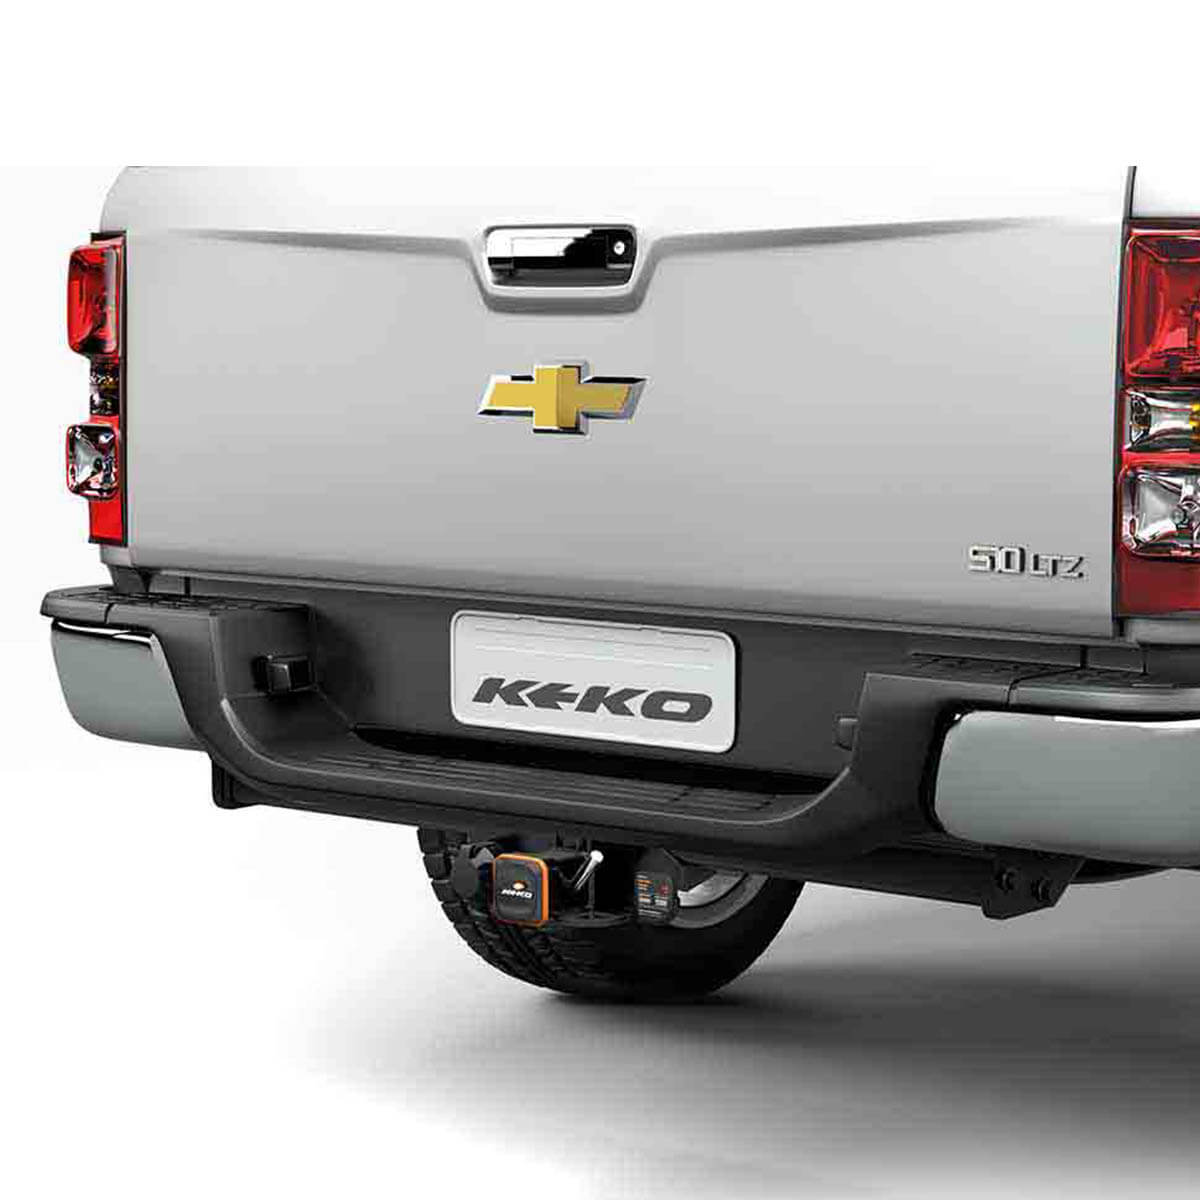 Engate de reboque Nova S10 2012 a 2017 Keko K1 removível 1500 kg